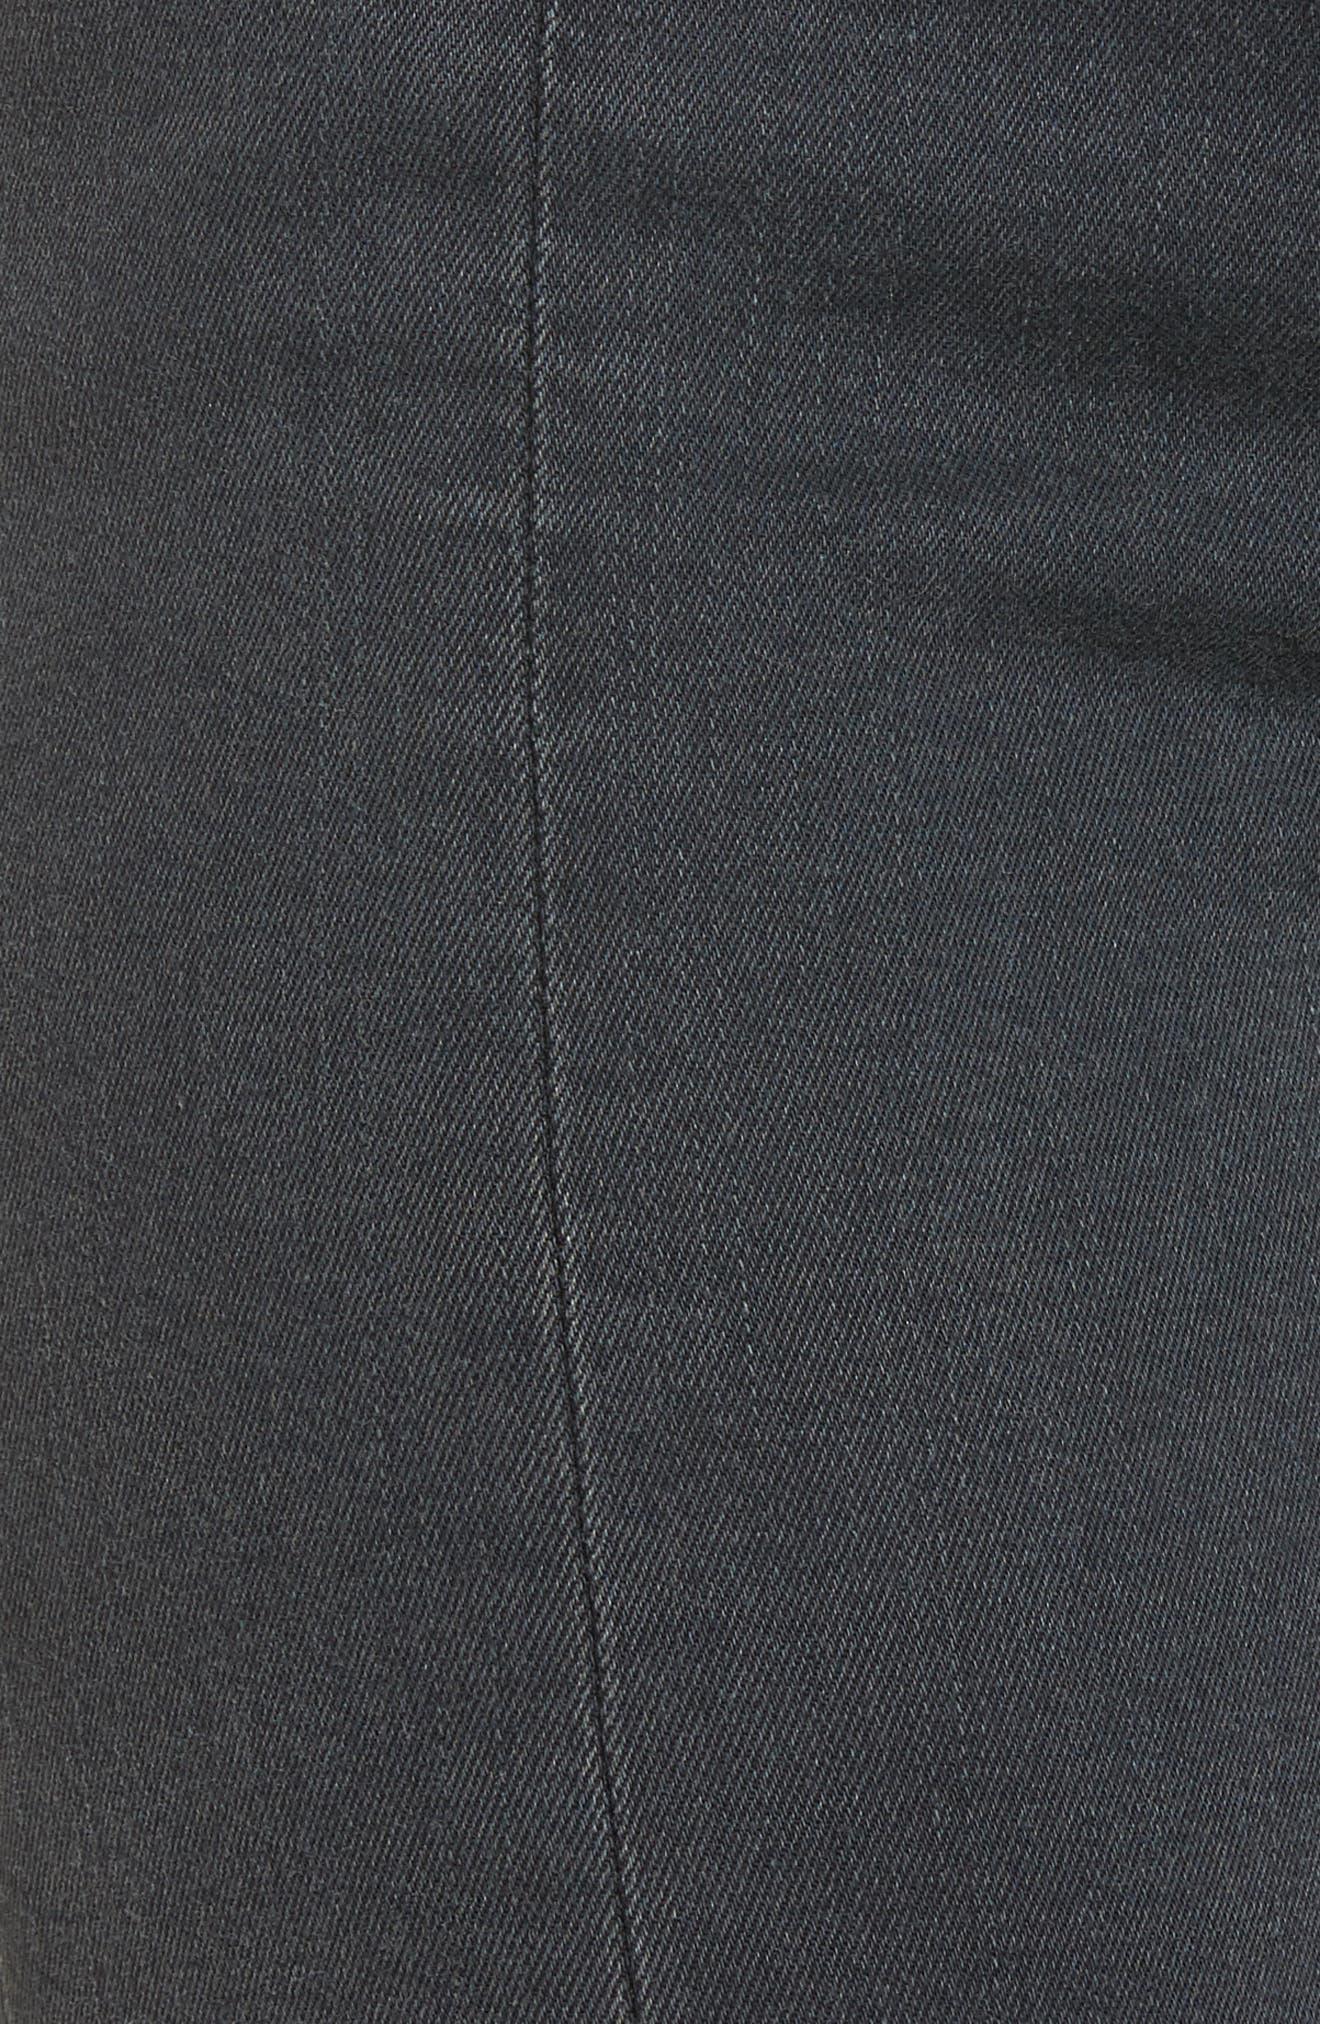 Alternate Image 5  - Vigoss Jagger Front Seam Skinny Jeans